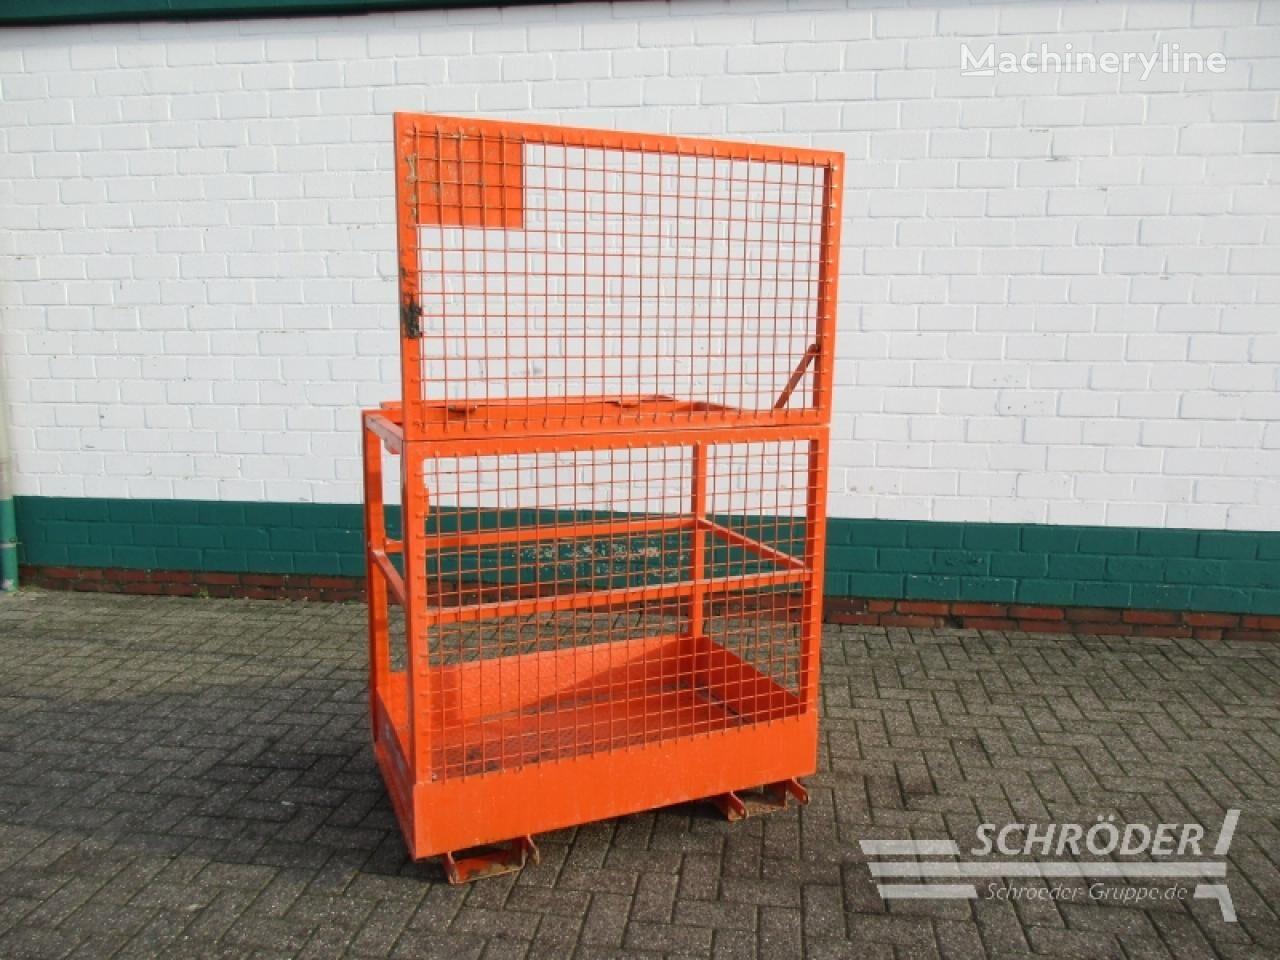 Jabelmann / EURO-Jabelmann Arbeitsbühne V 1500 AB other equipment